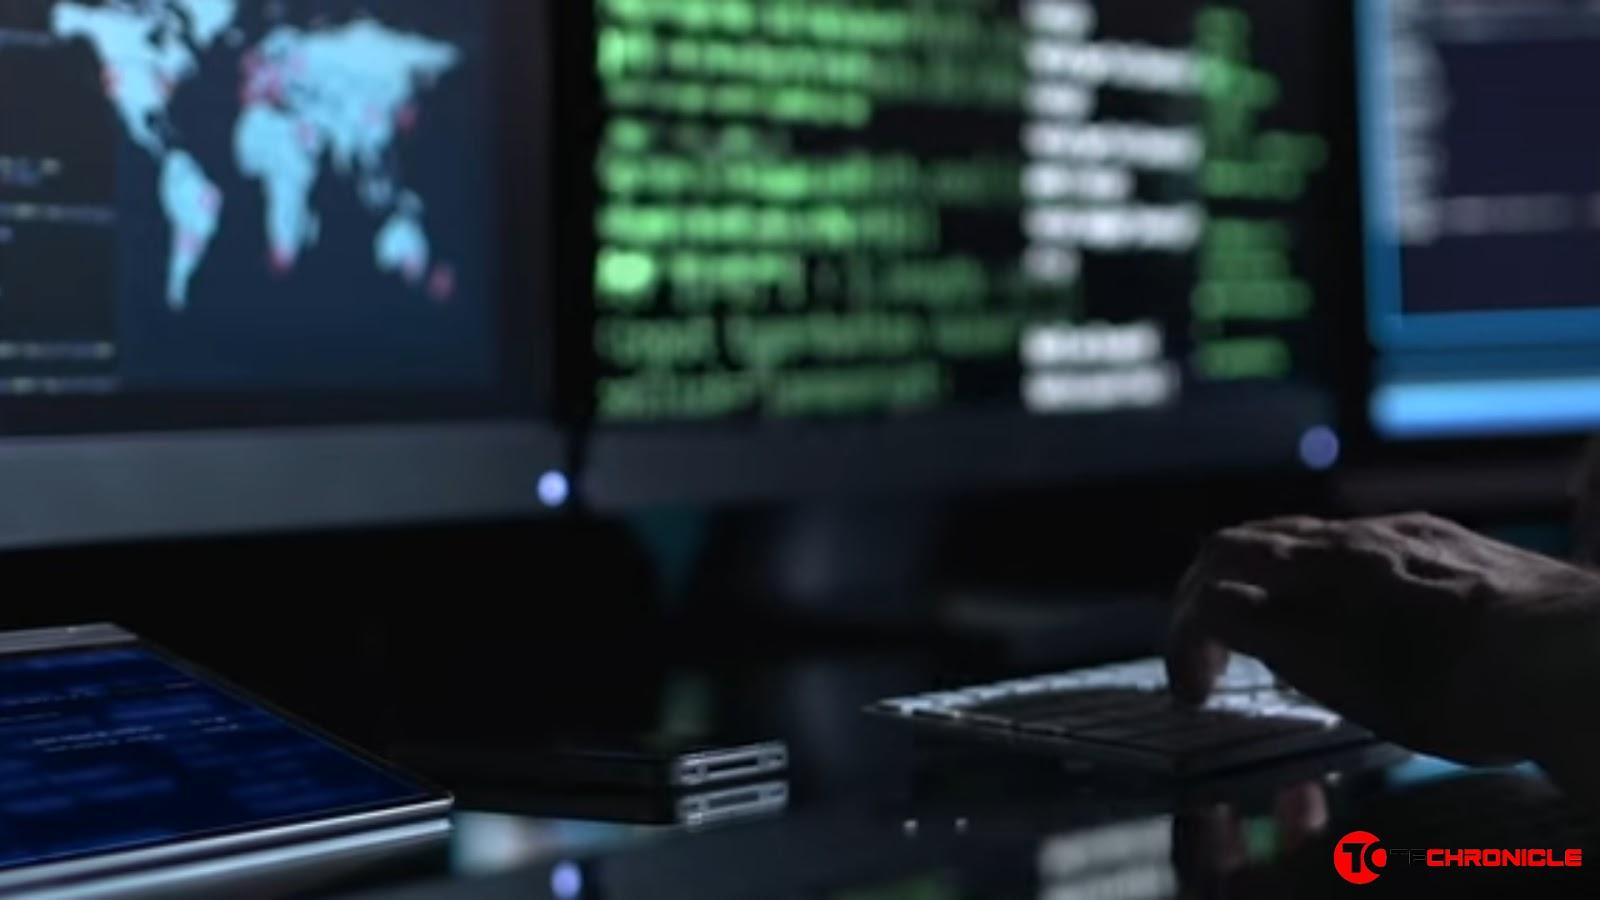 Hacking Screen Techronicle